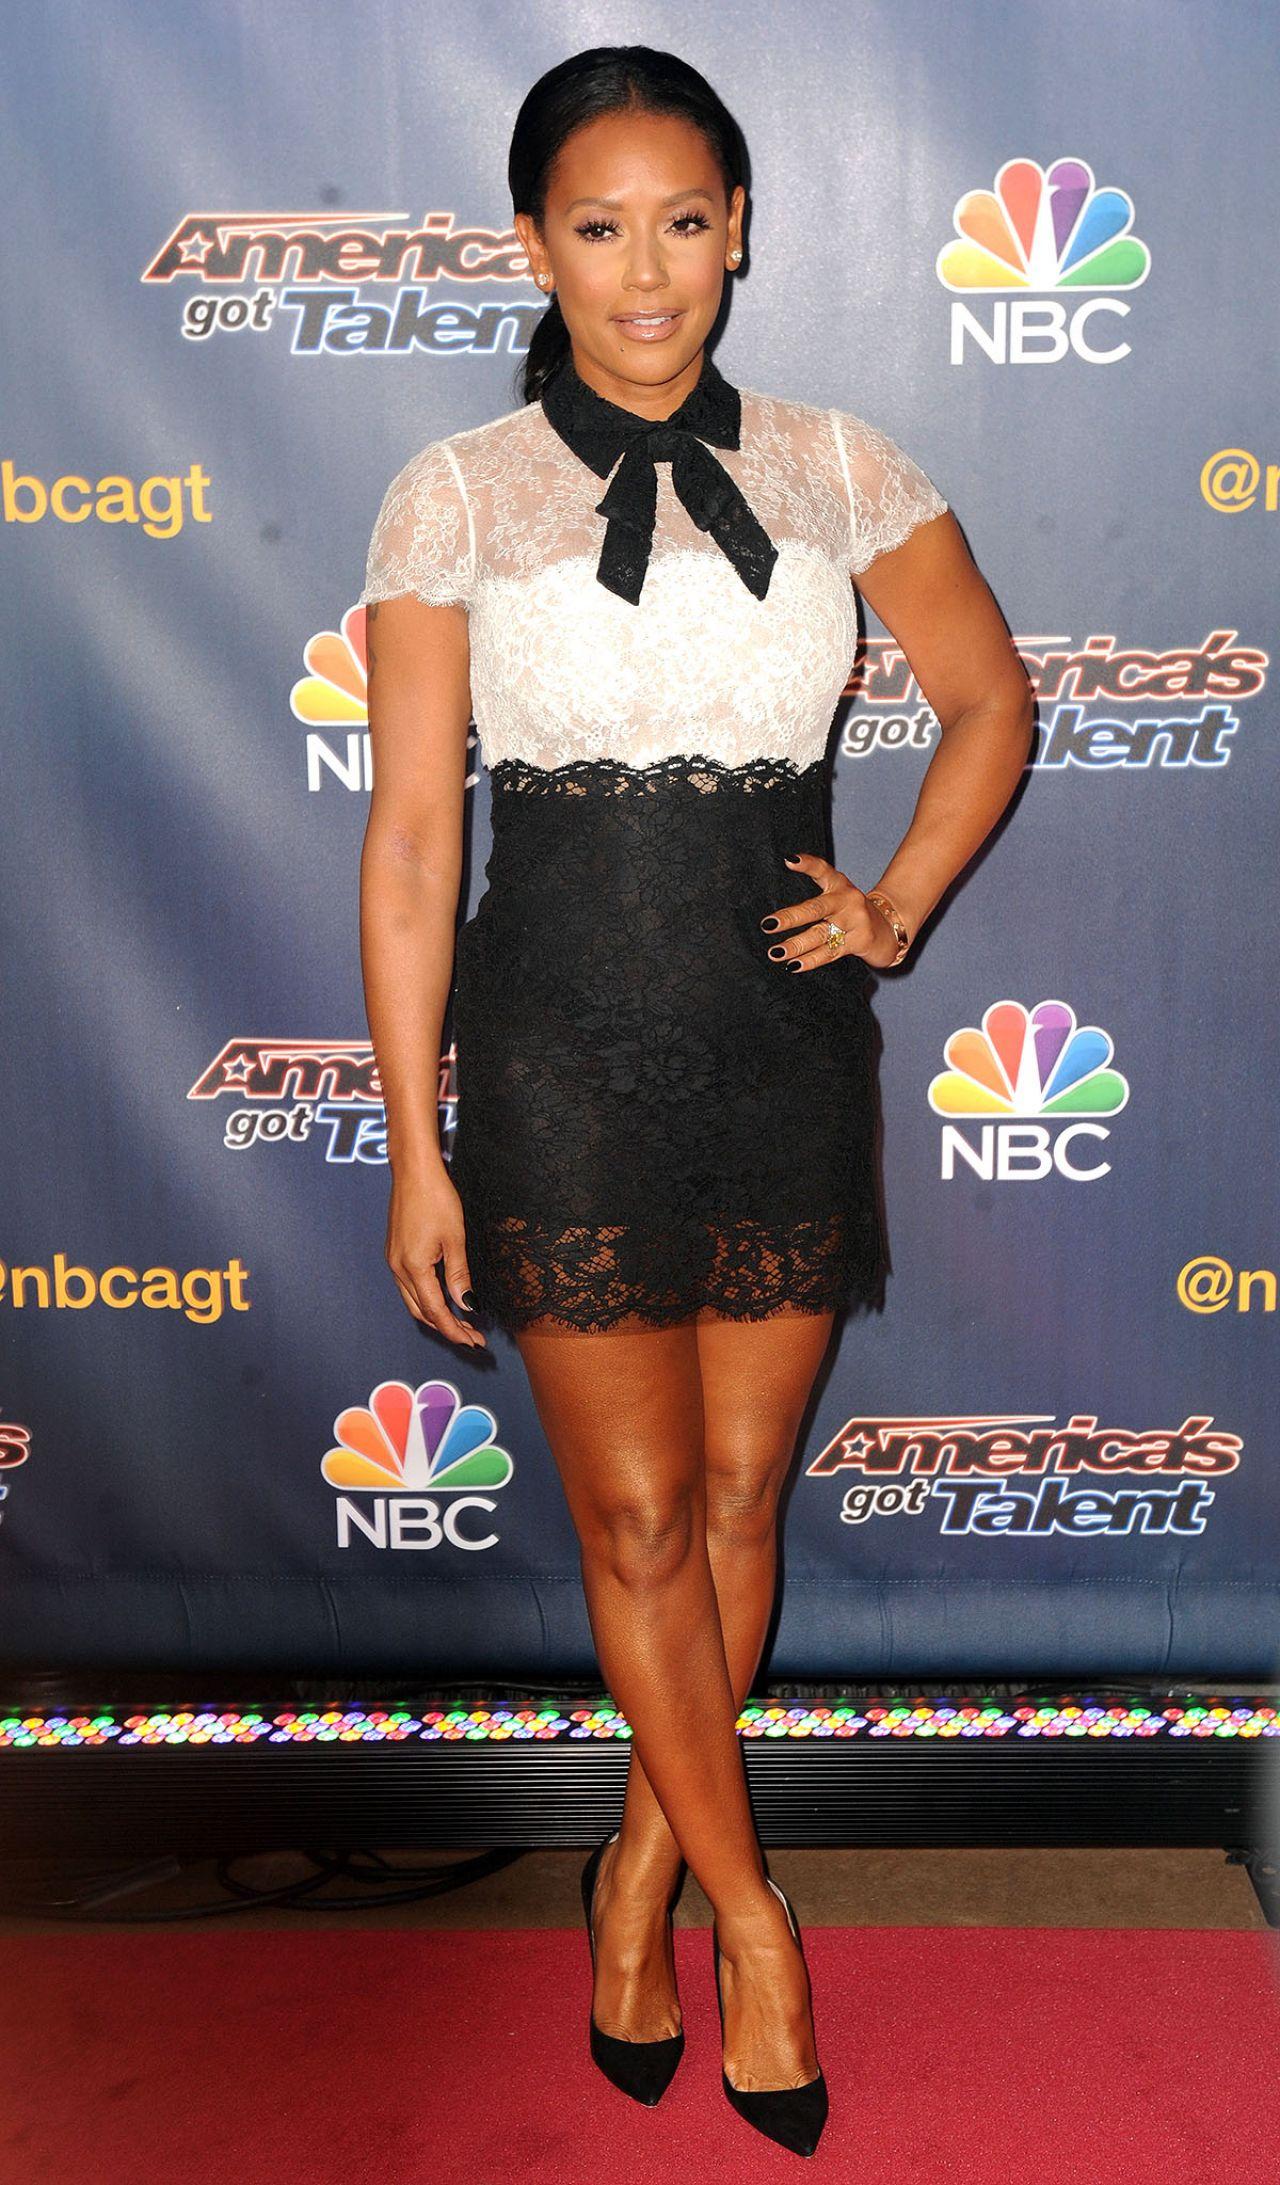 America S Best Lifechangers: 'America's Got Talent' Season 9 Pre Show